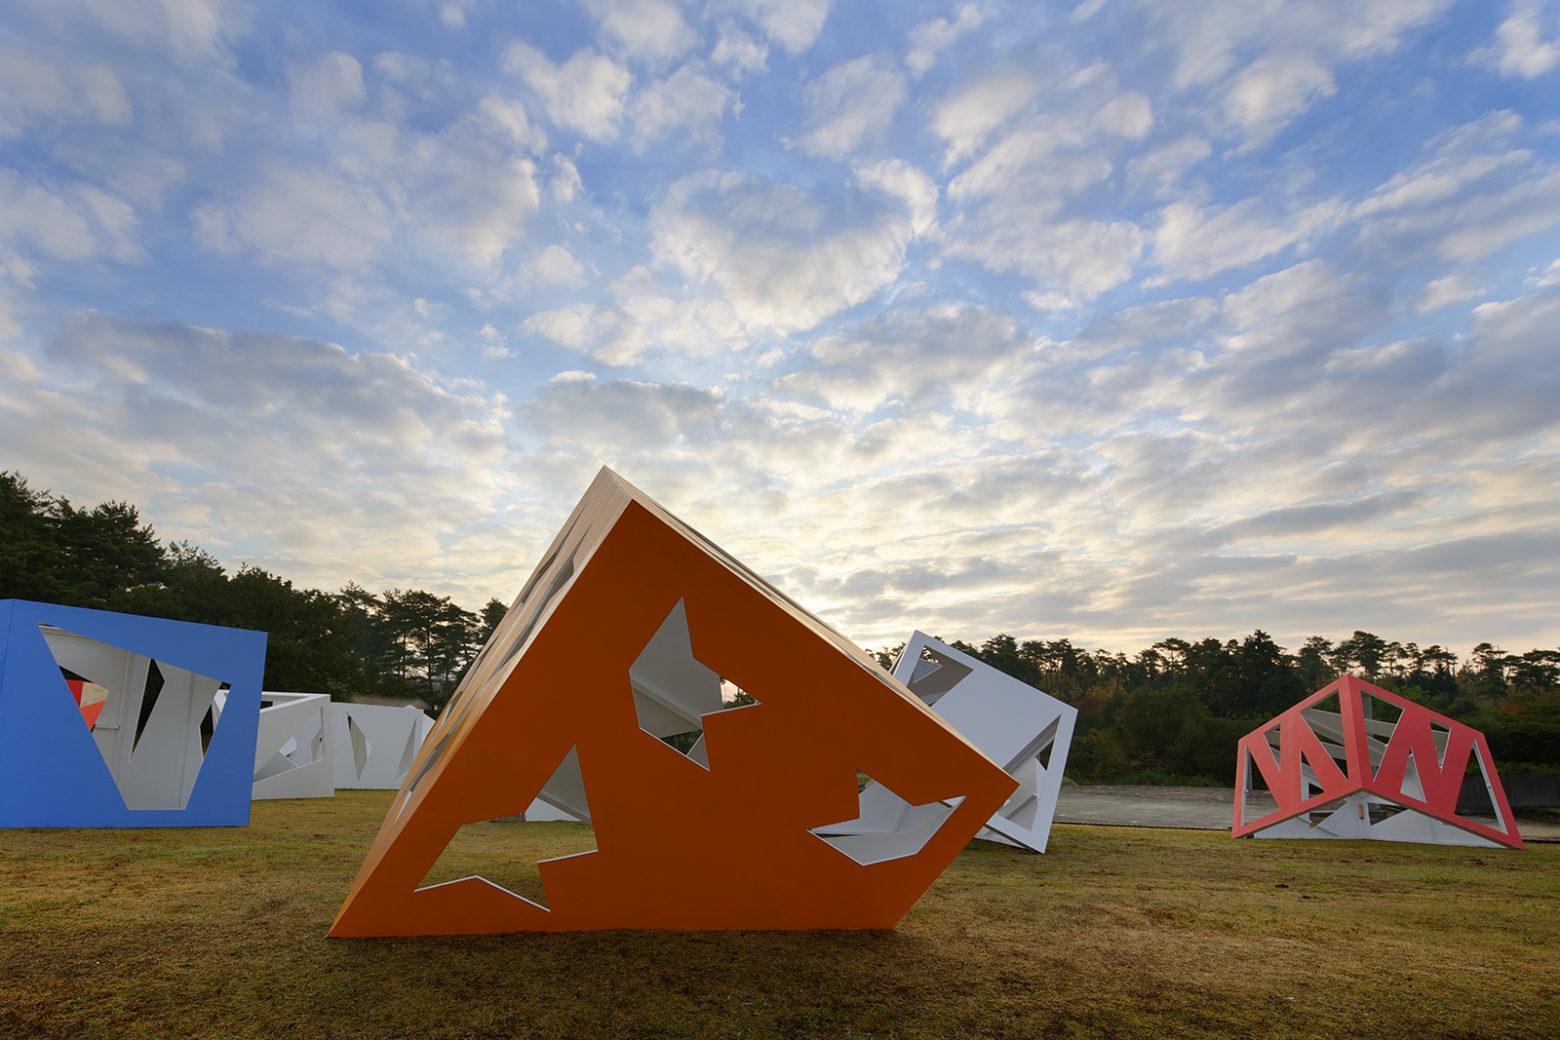 Moriyuki Ochiai outdoor art